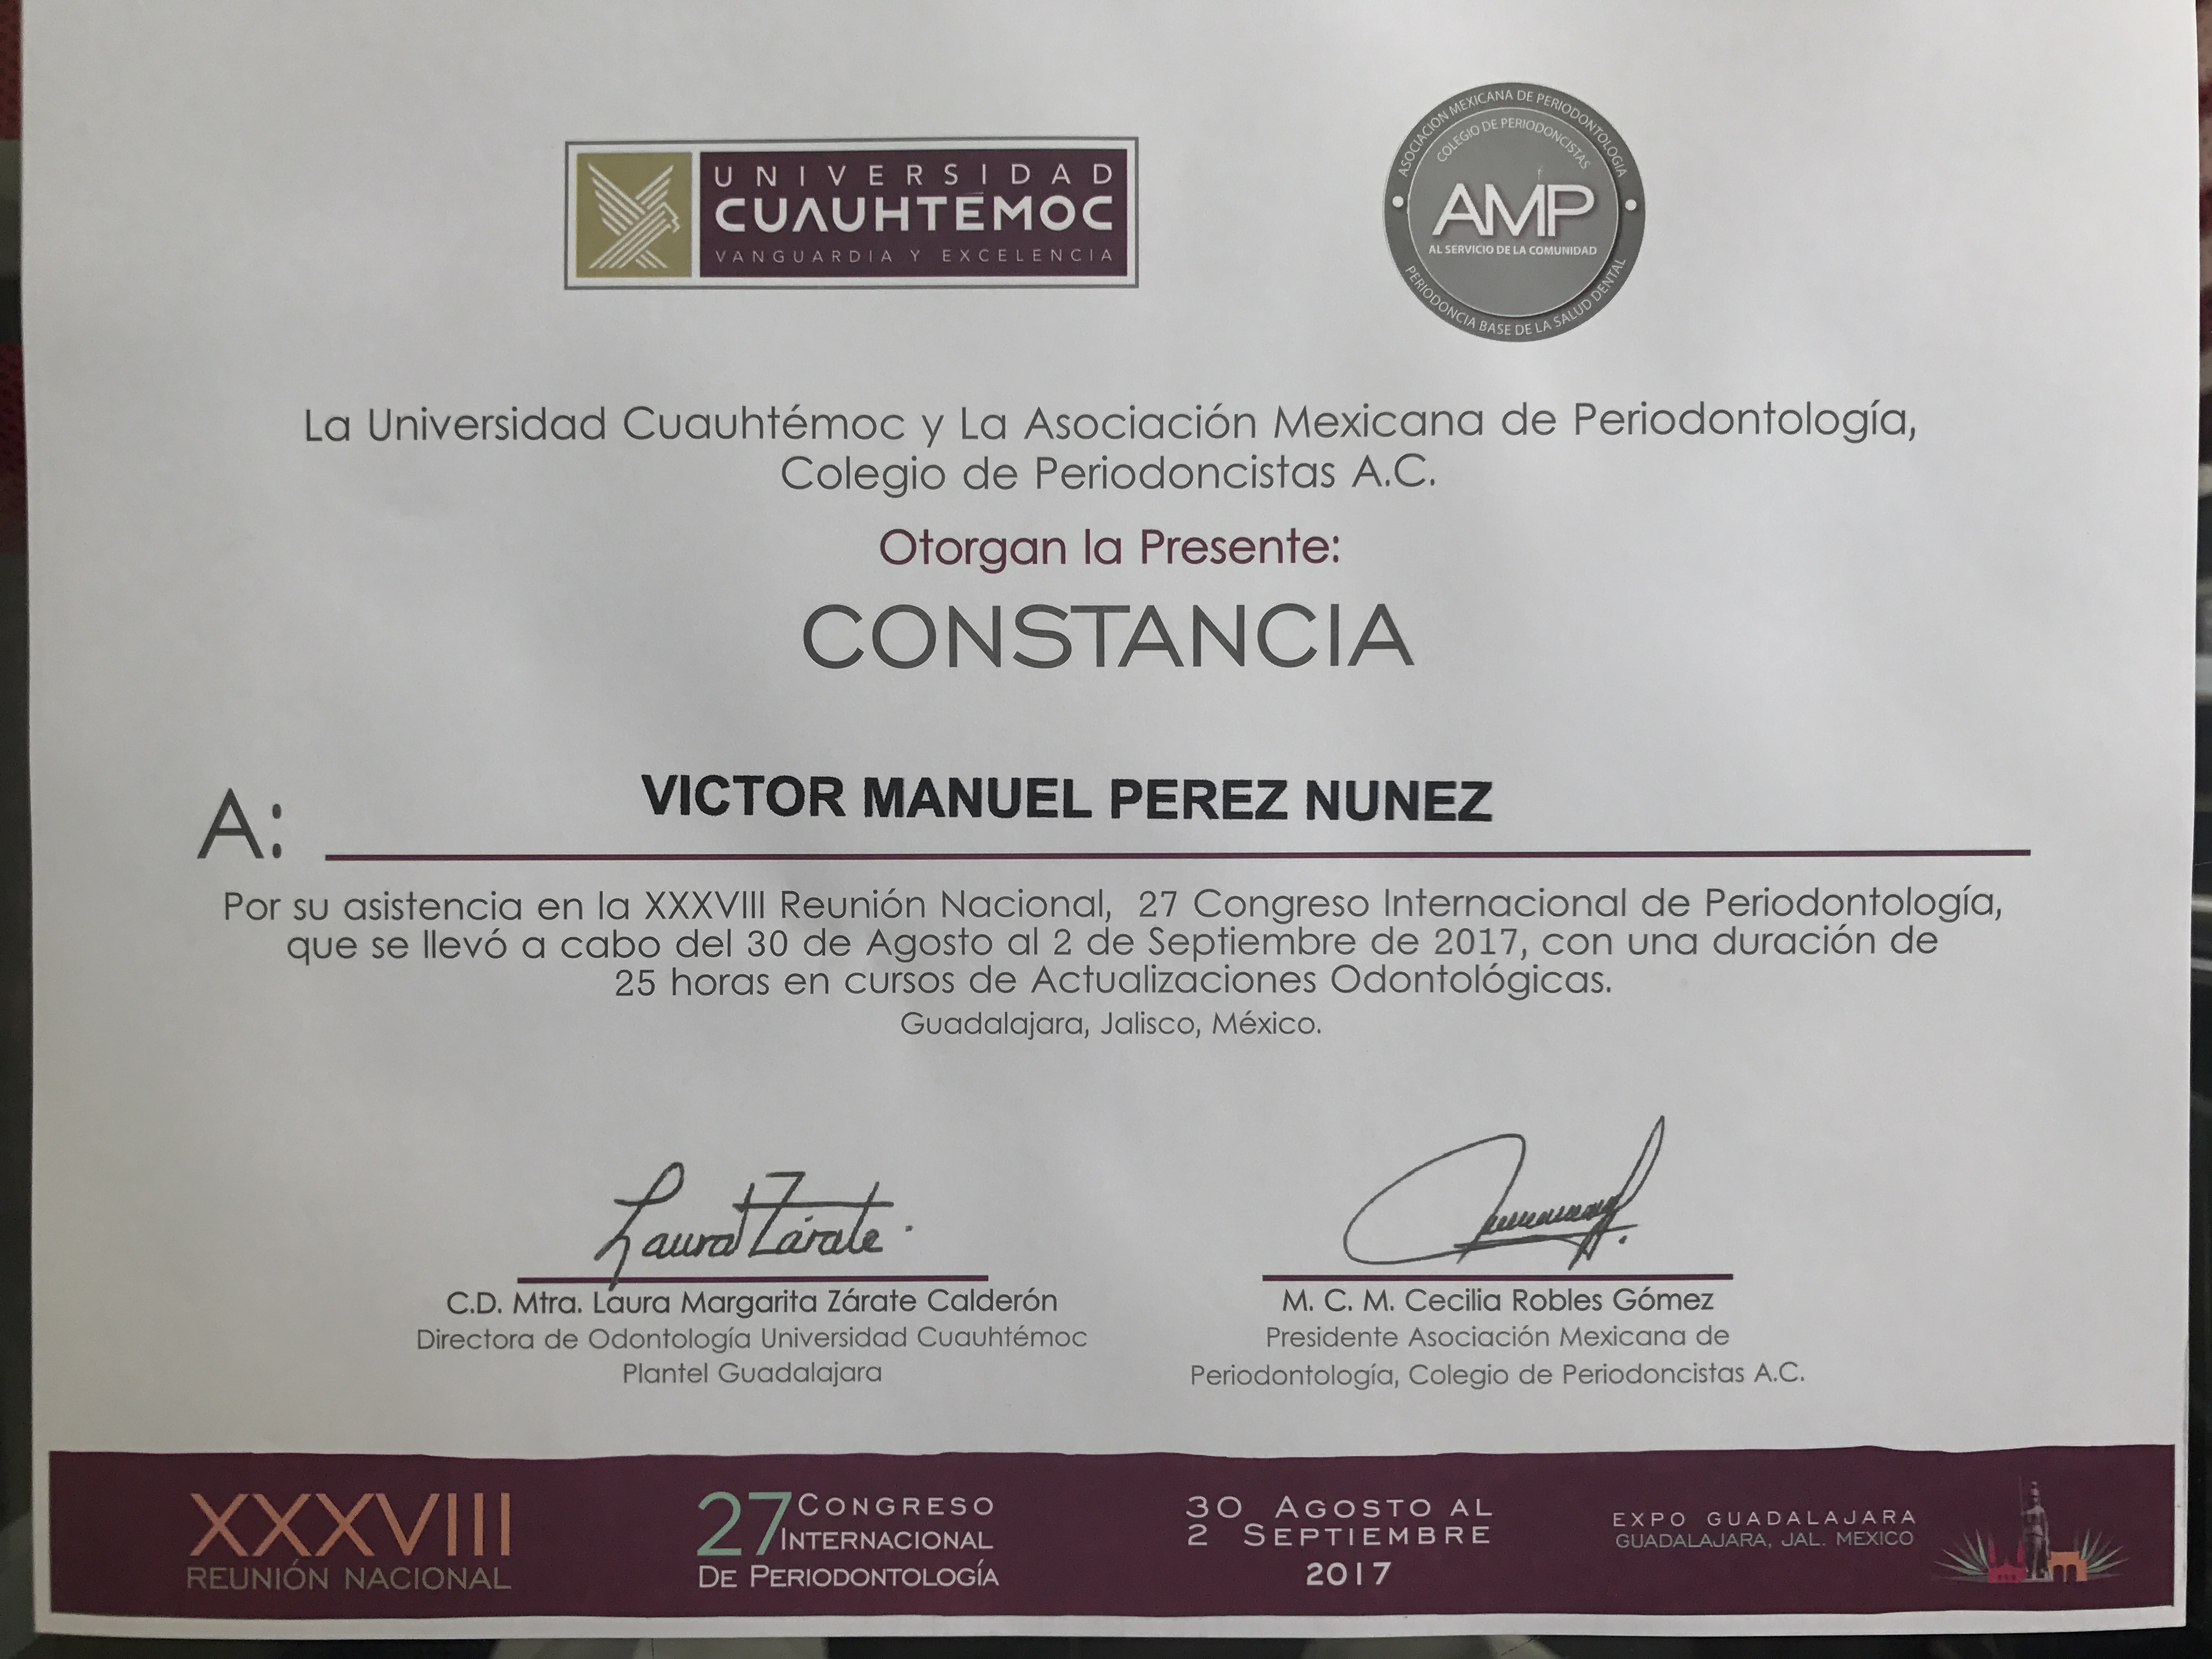 Guadalajara Jalisco, Mexico